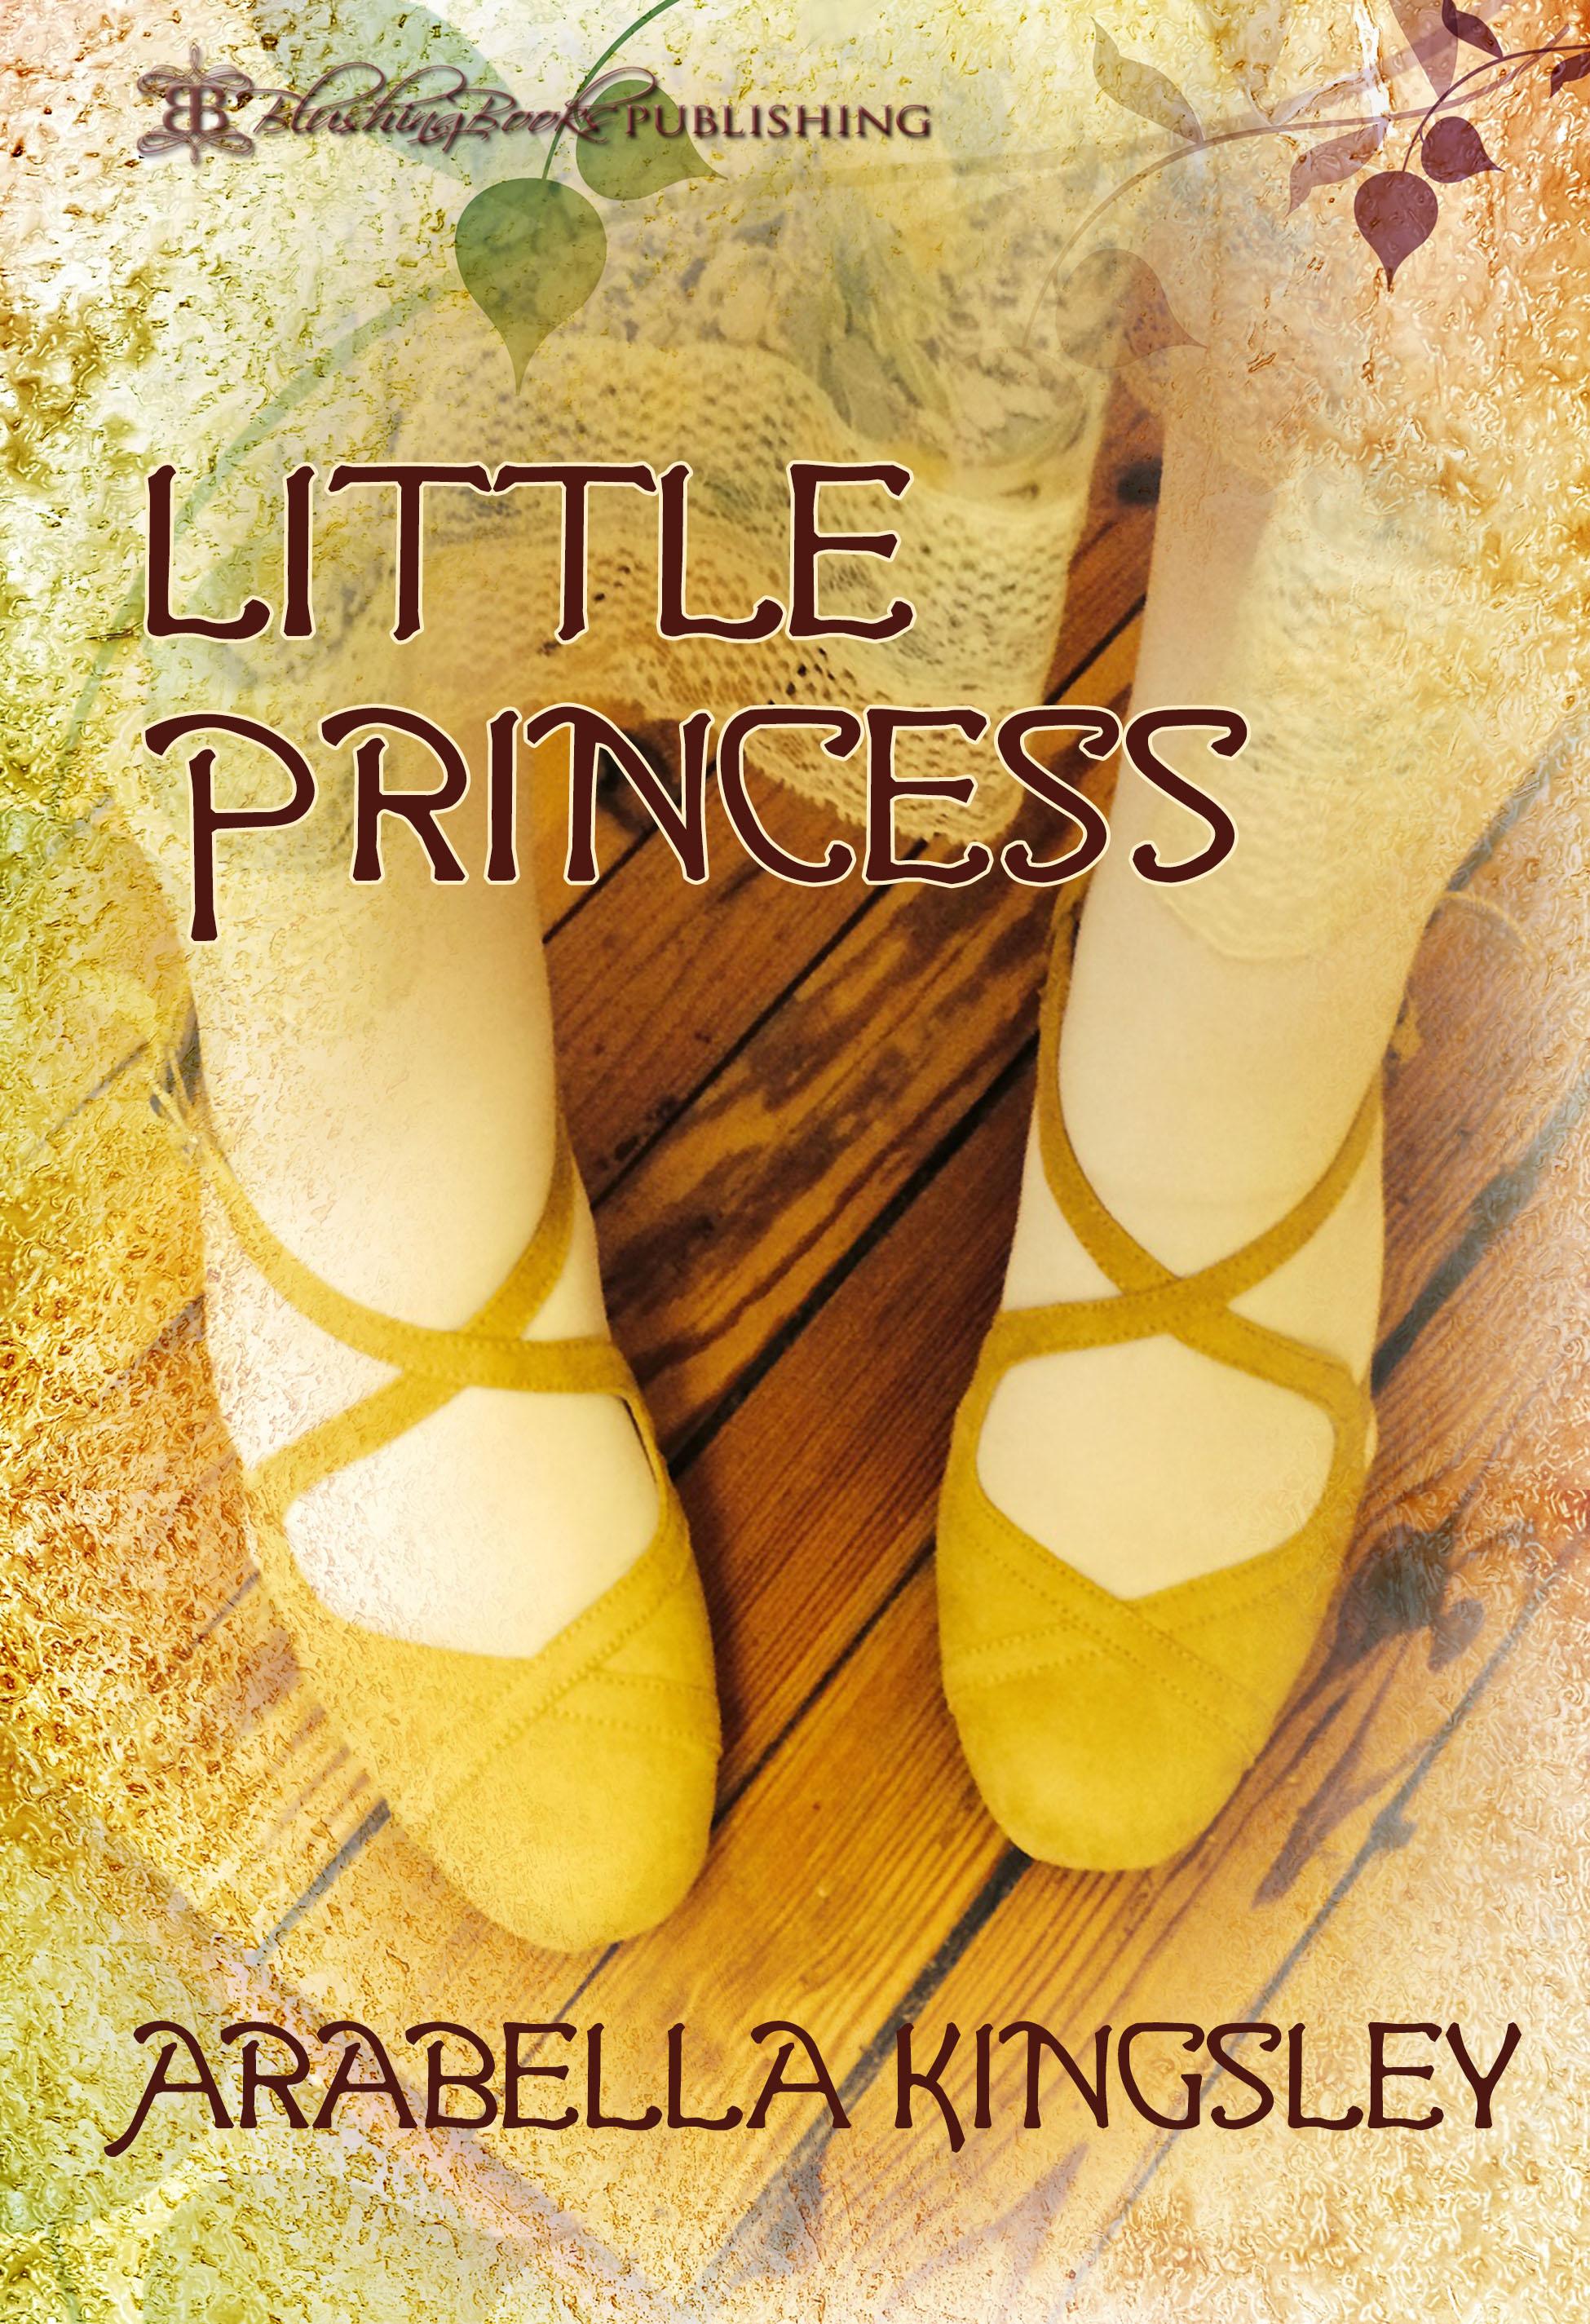 Arabella Kingsley - Little Princess